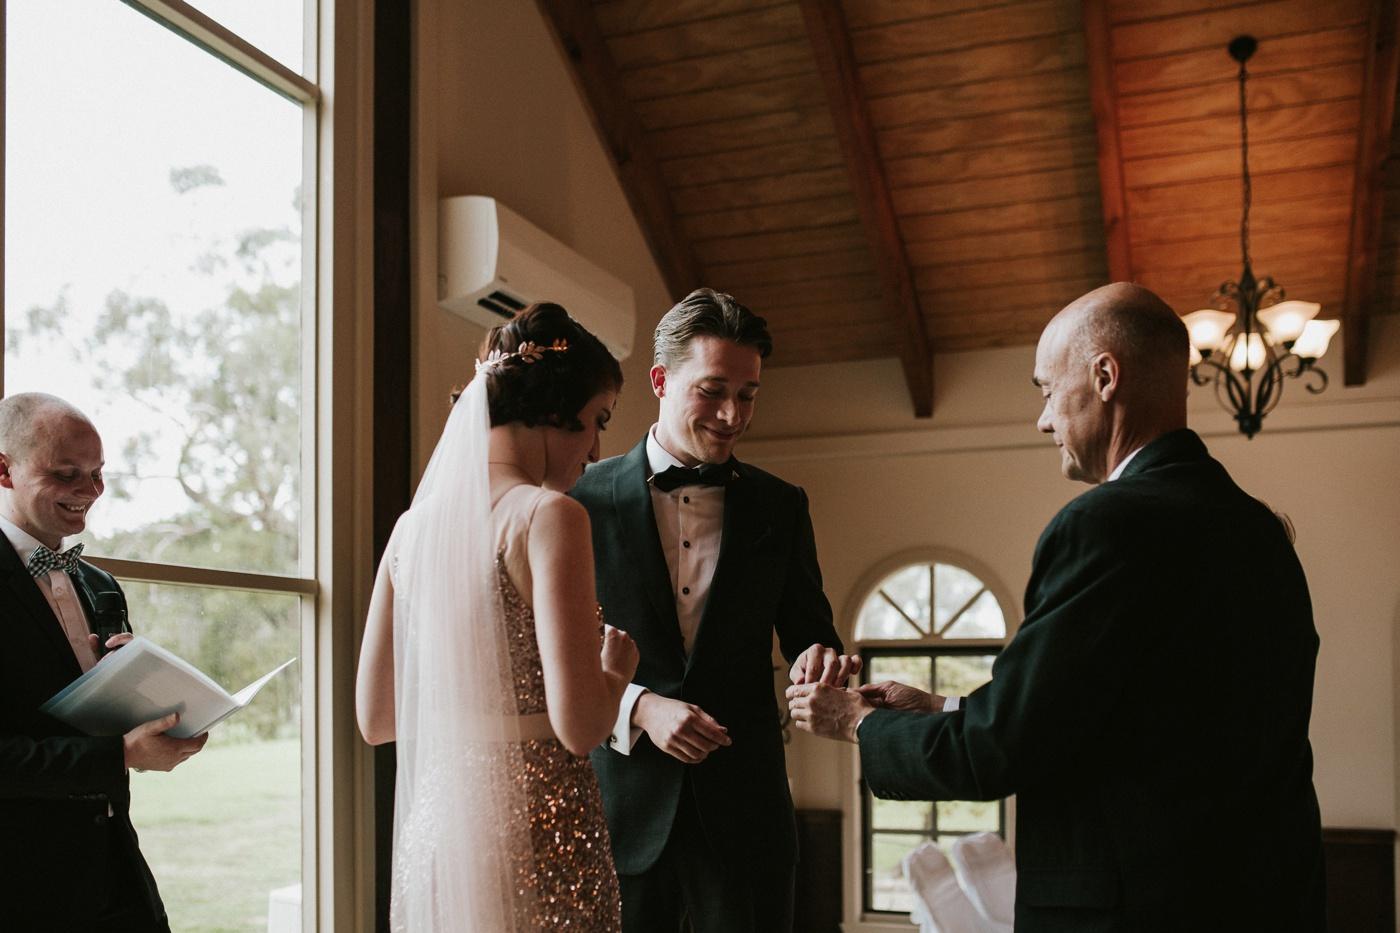 Emma&Morgan_Melbourne-Vintage-Elegant-Fun-Quirky-Yarra-Valley-Vineyard-Wedding_Melbourne-Wedding-Photography-51